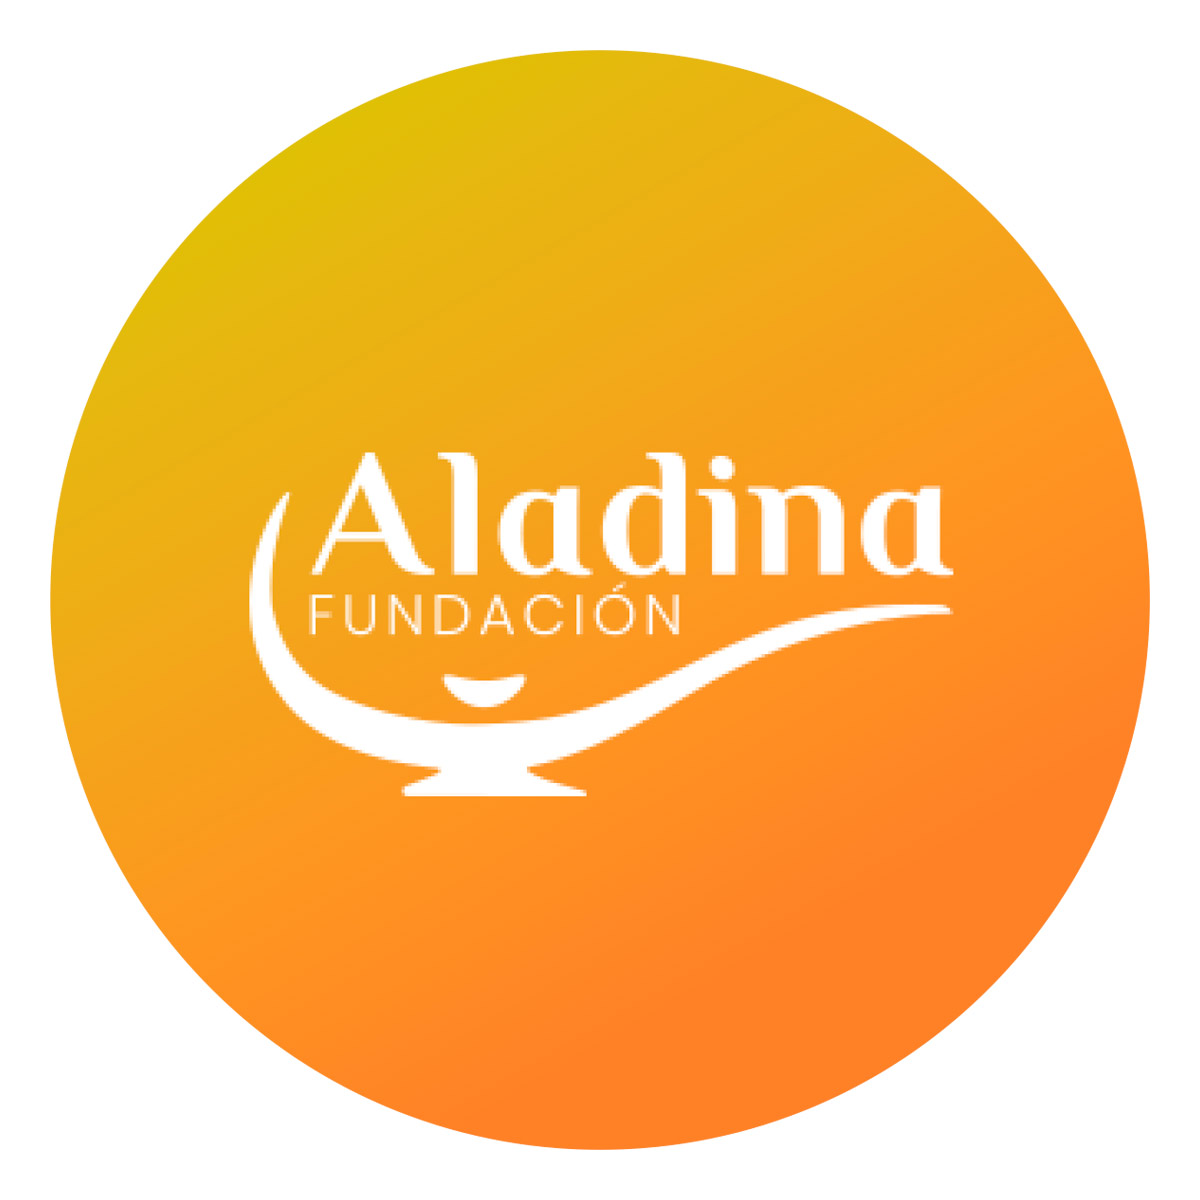 Aladina-fundacion